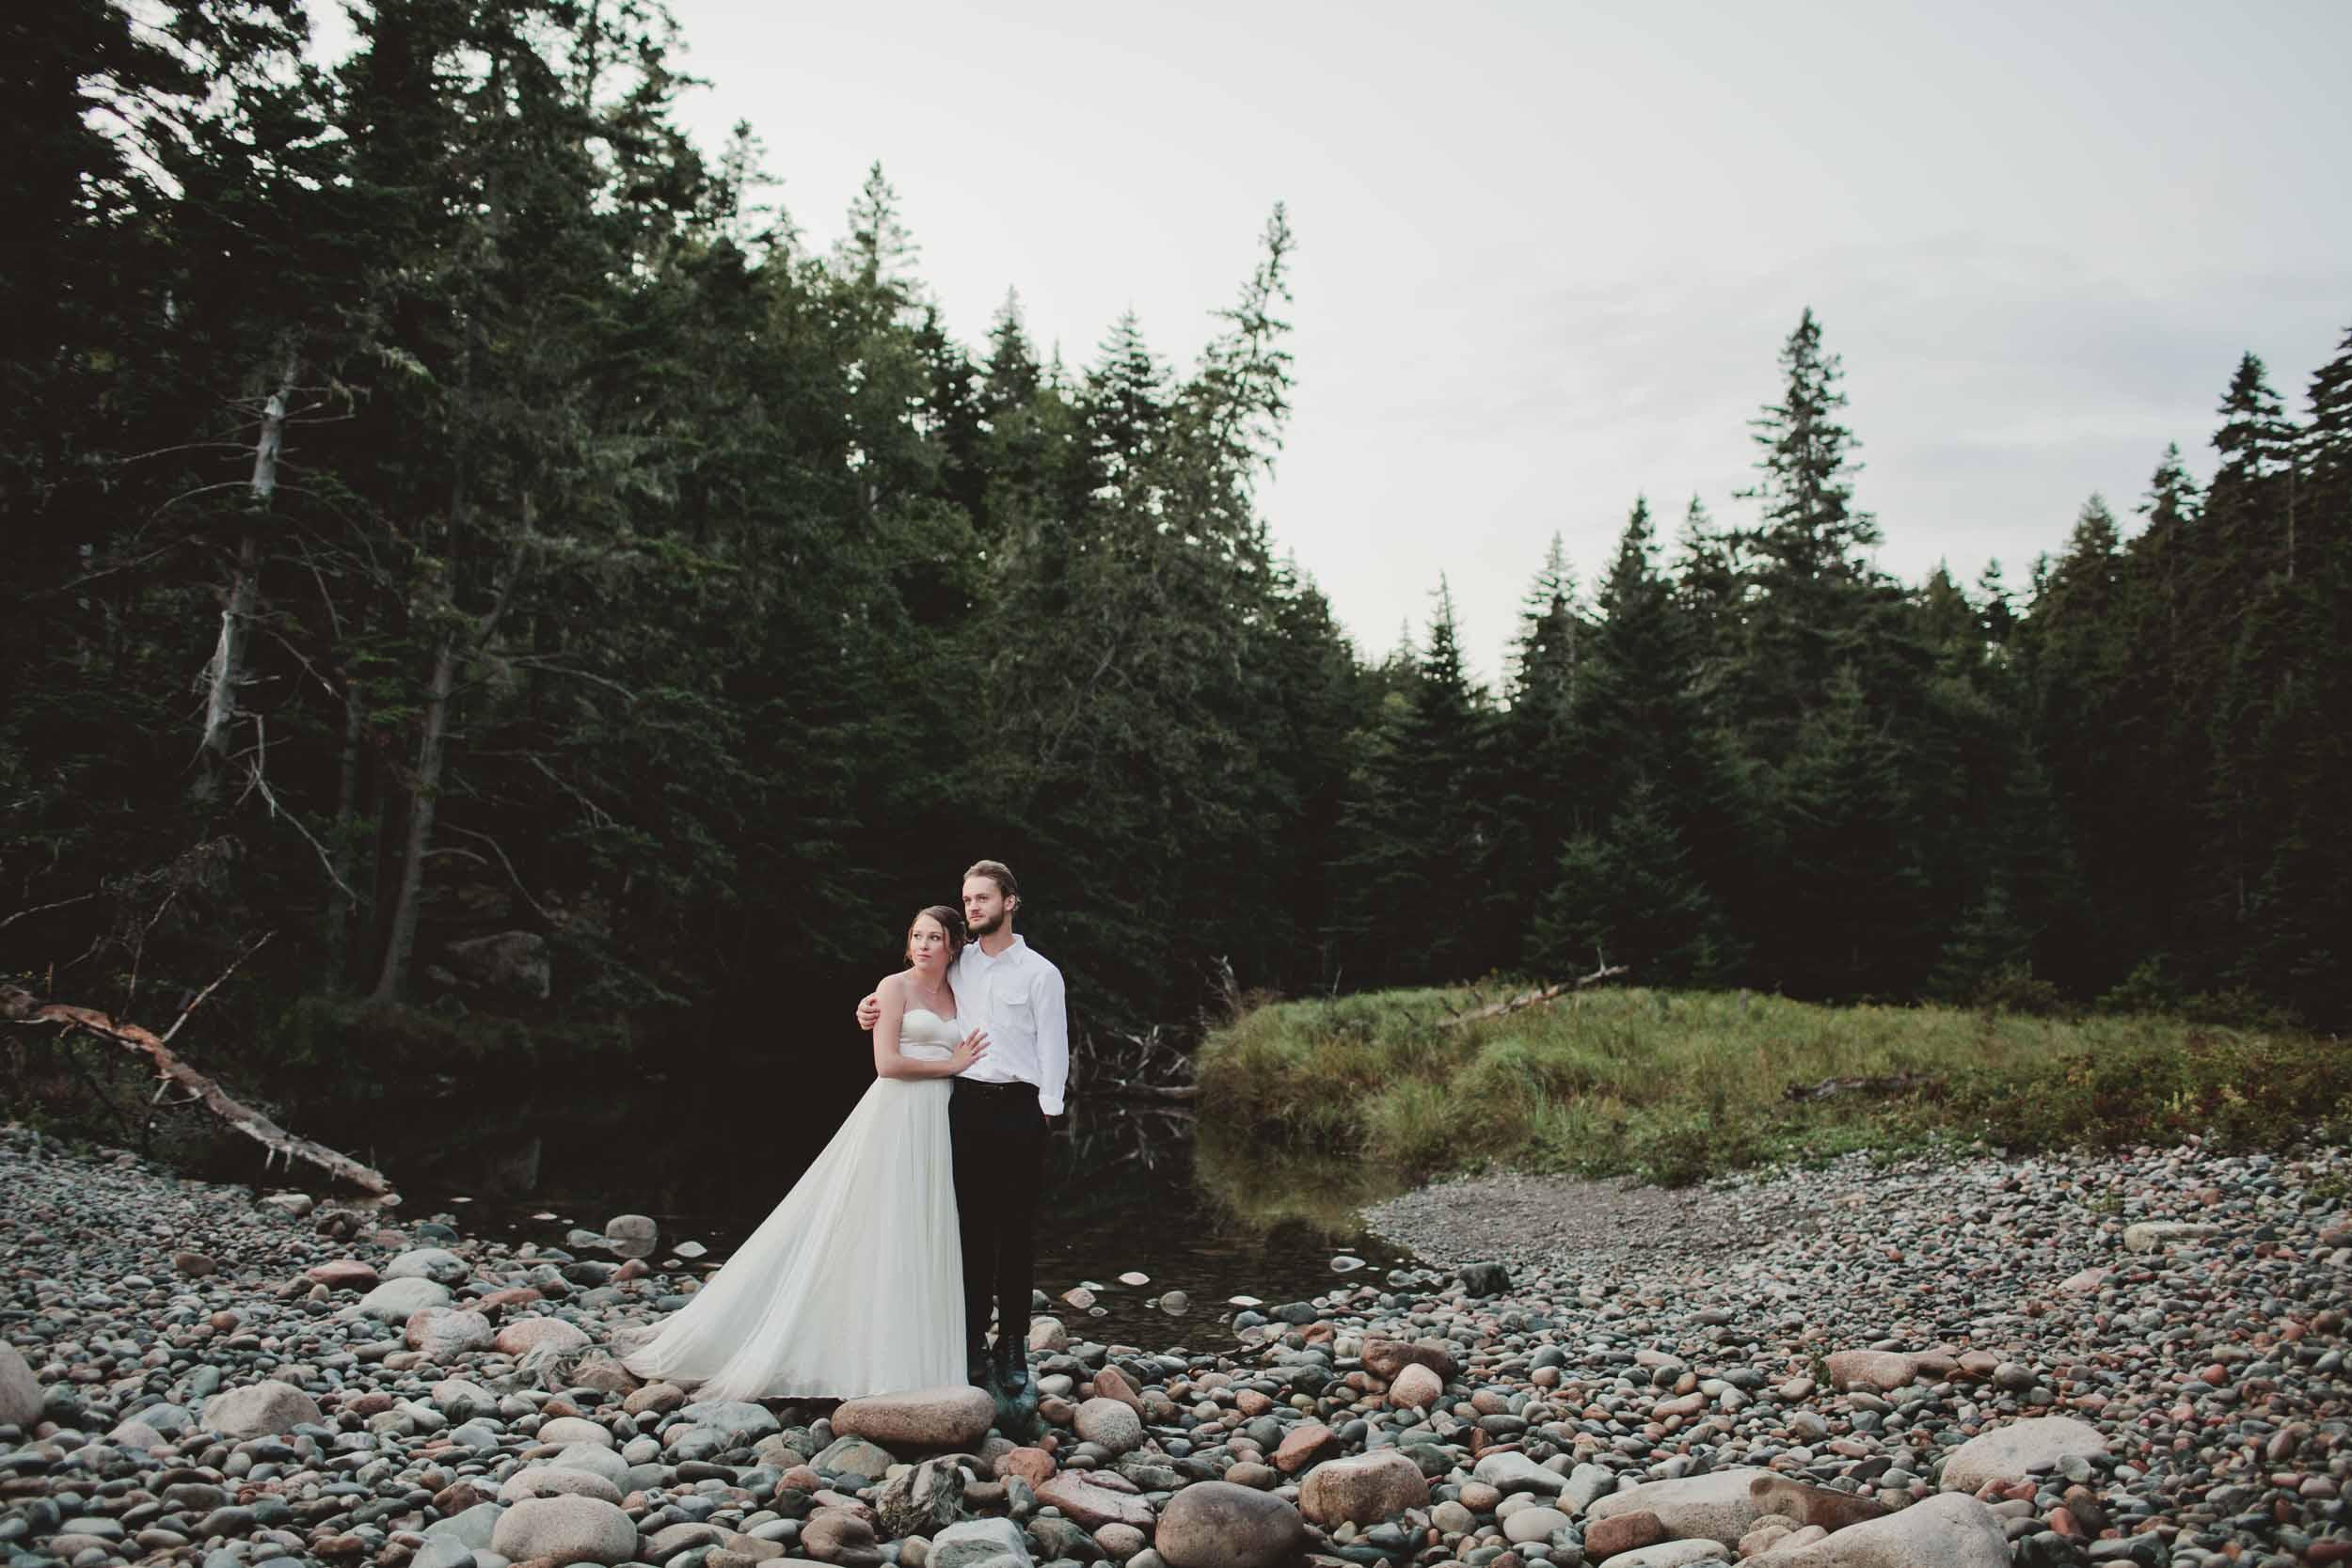 Maine-Elopement-Photographer35.jpg